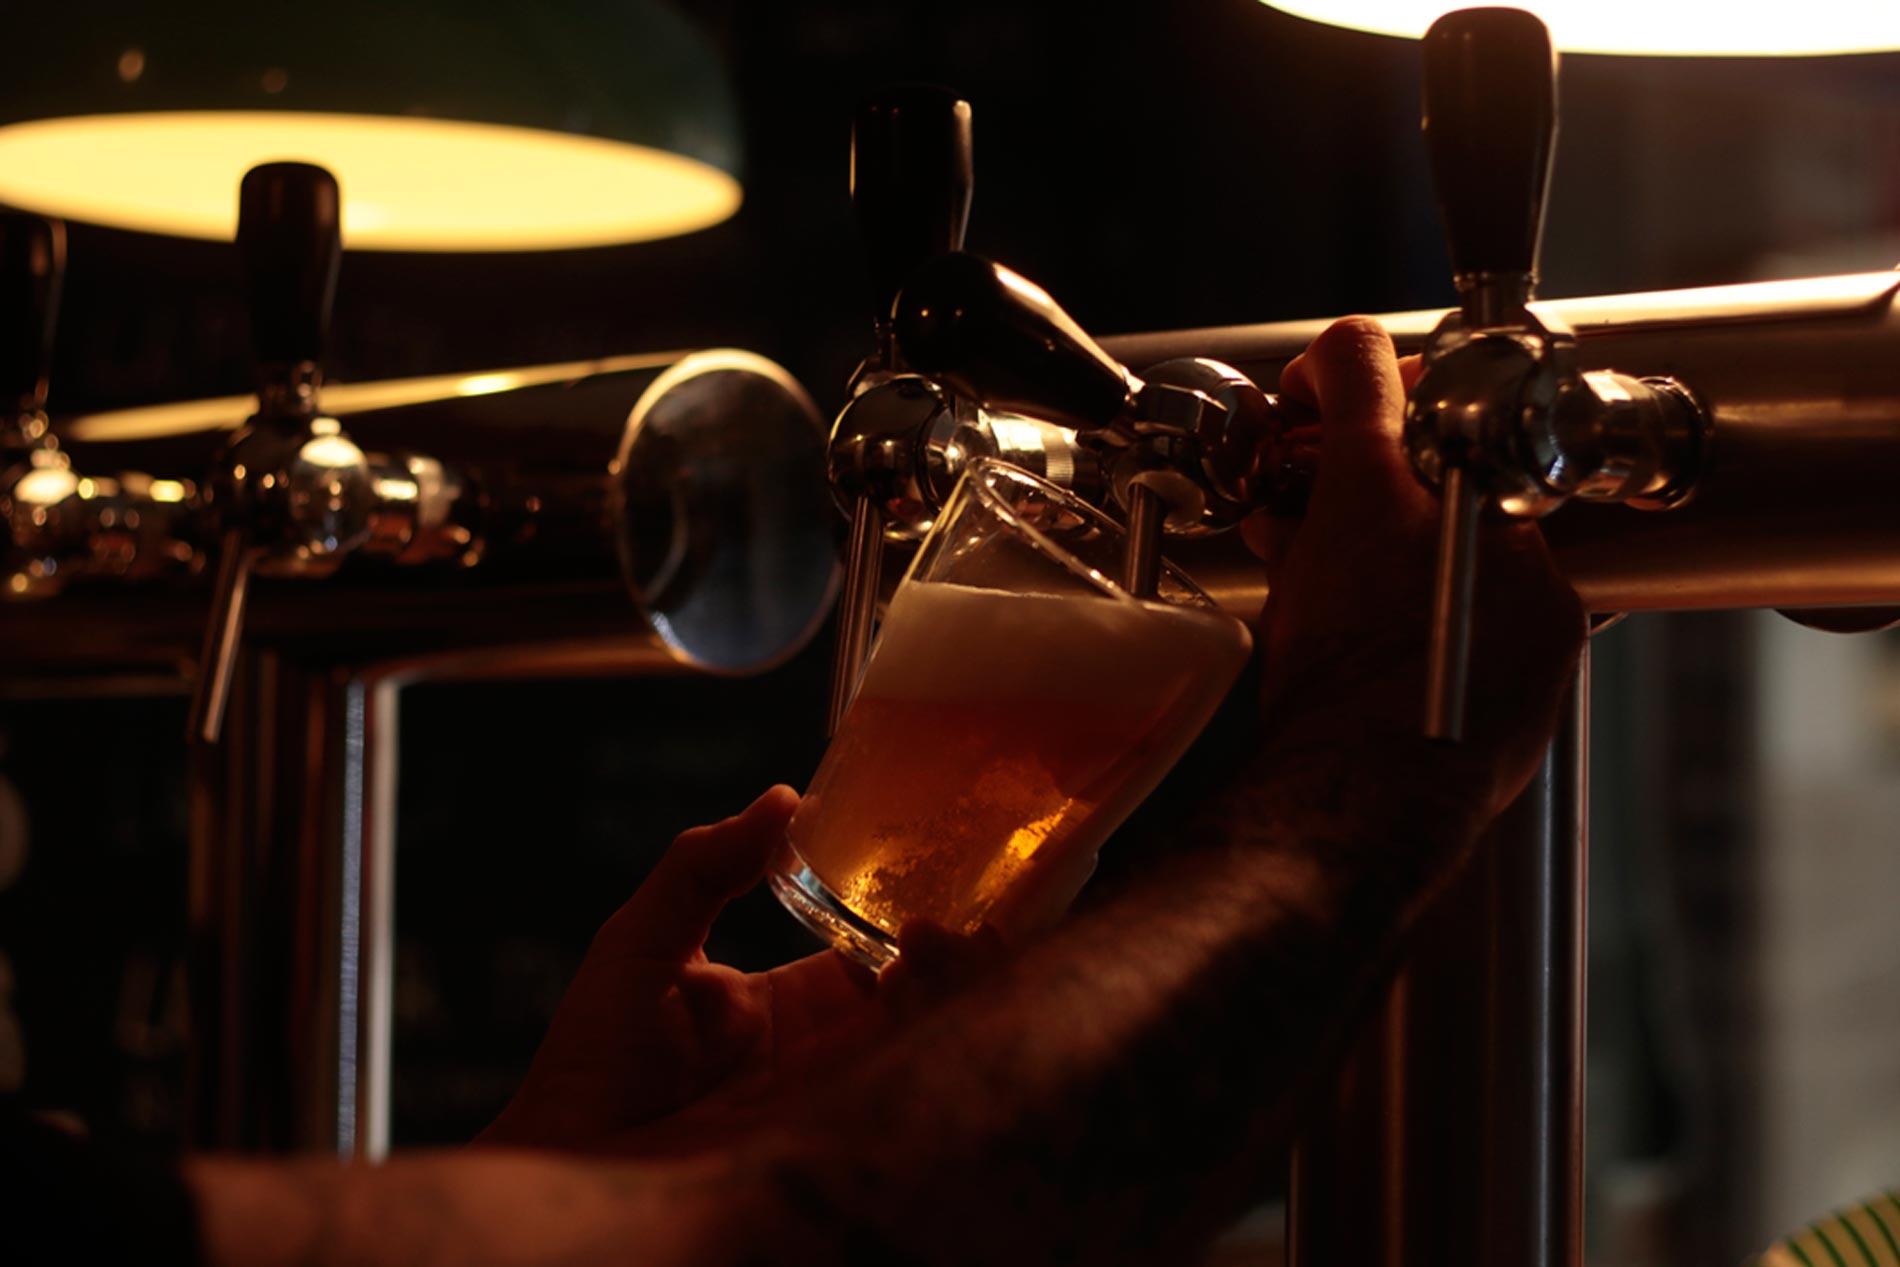 9 santuarios para beber cerveza artesana en Madrid